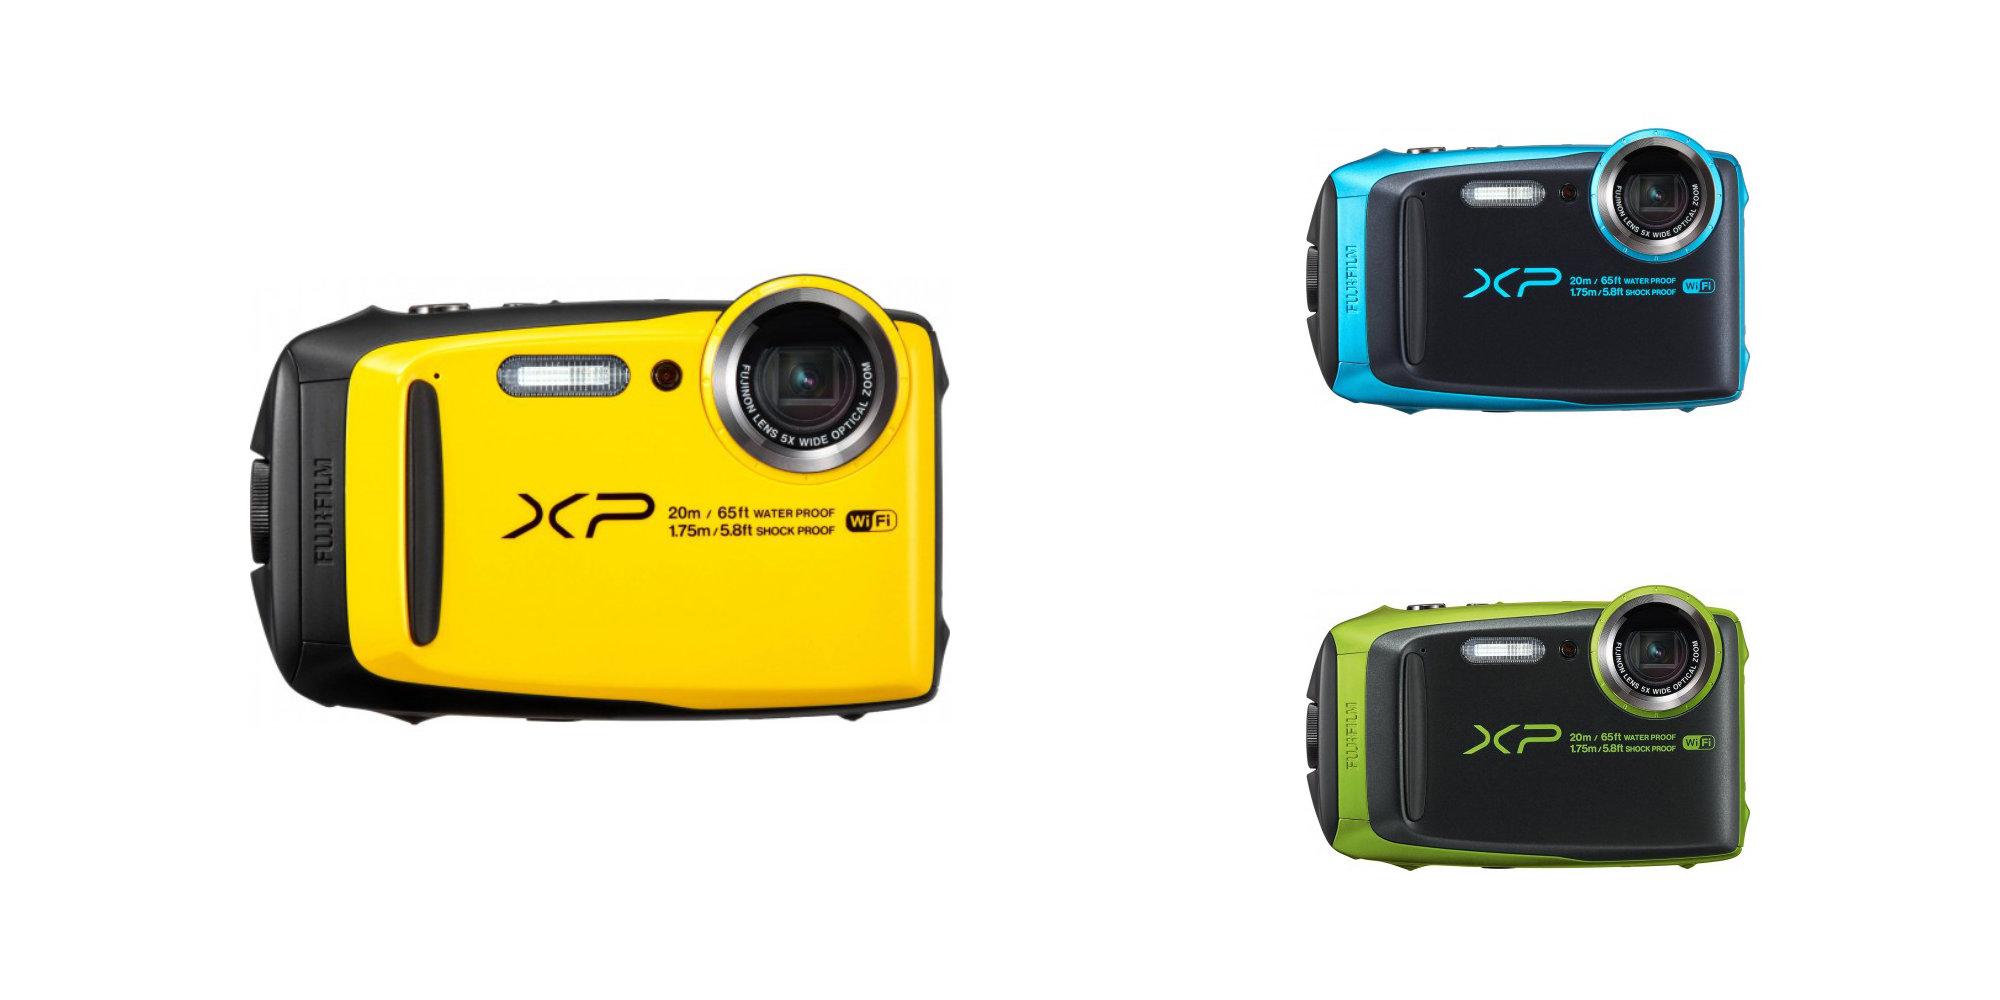 Snap photos 65-feet underwater w/ Fujifilm's FinePix Digital Camera: $99 (Refurb, Orig. $200)